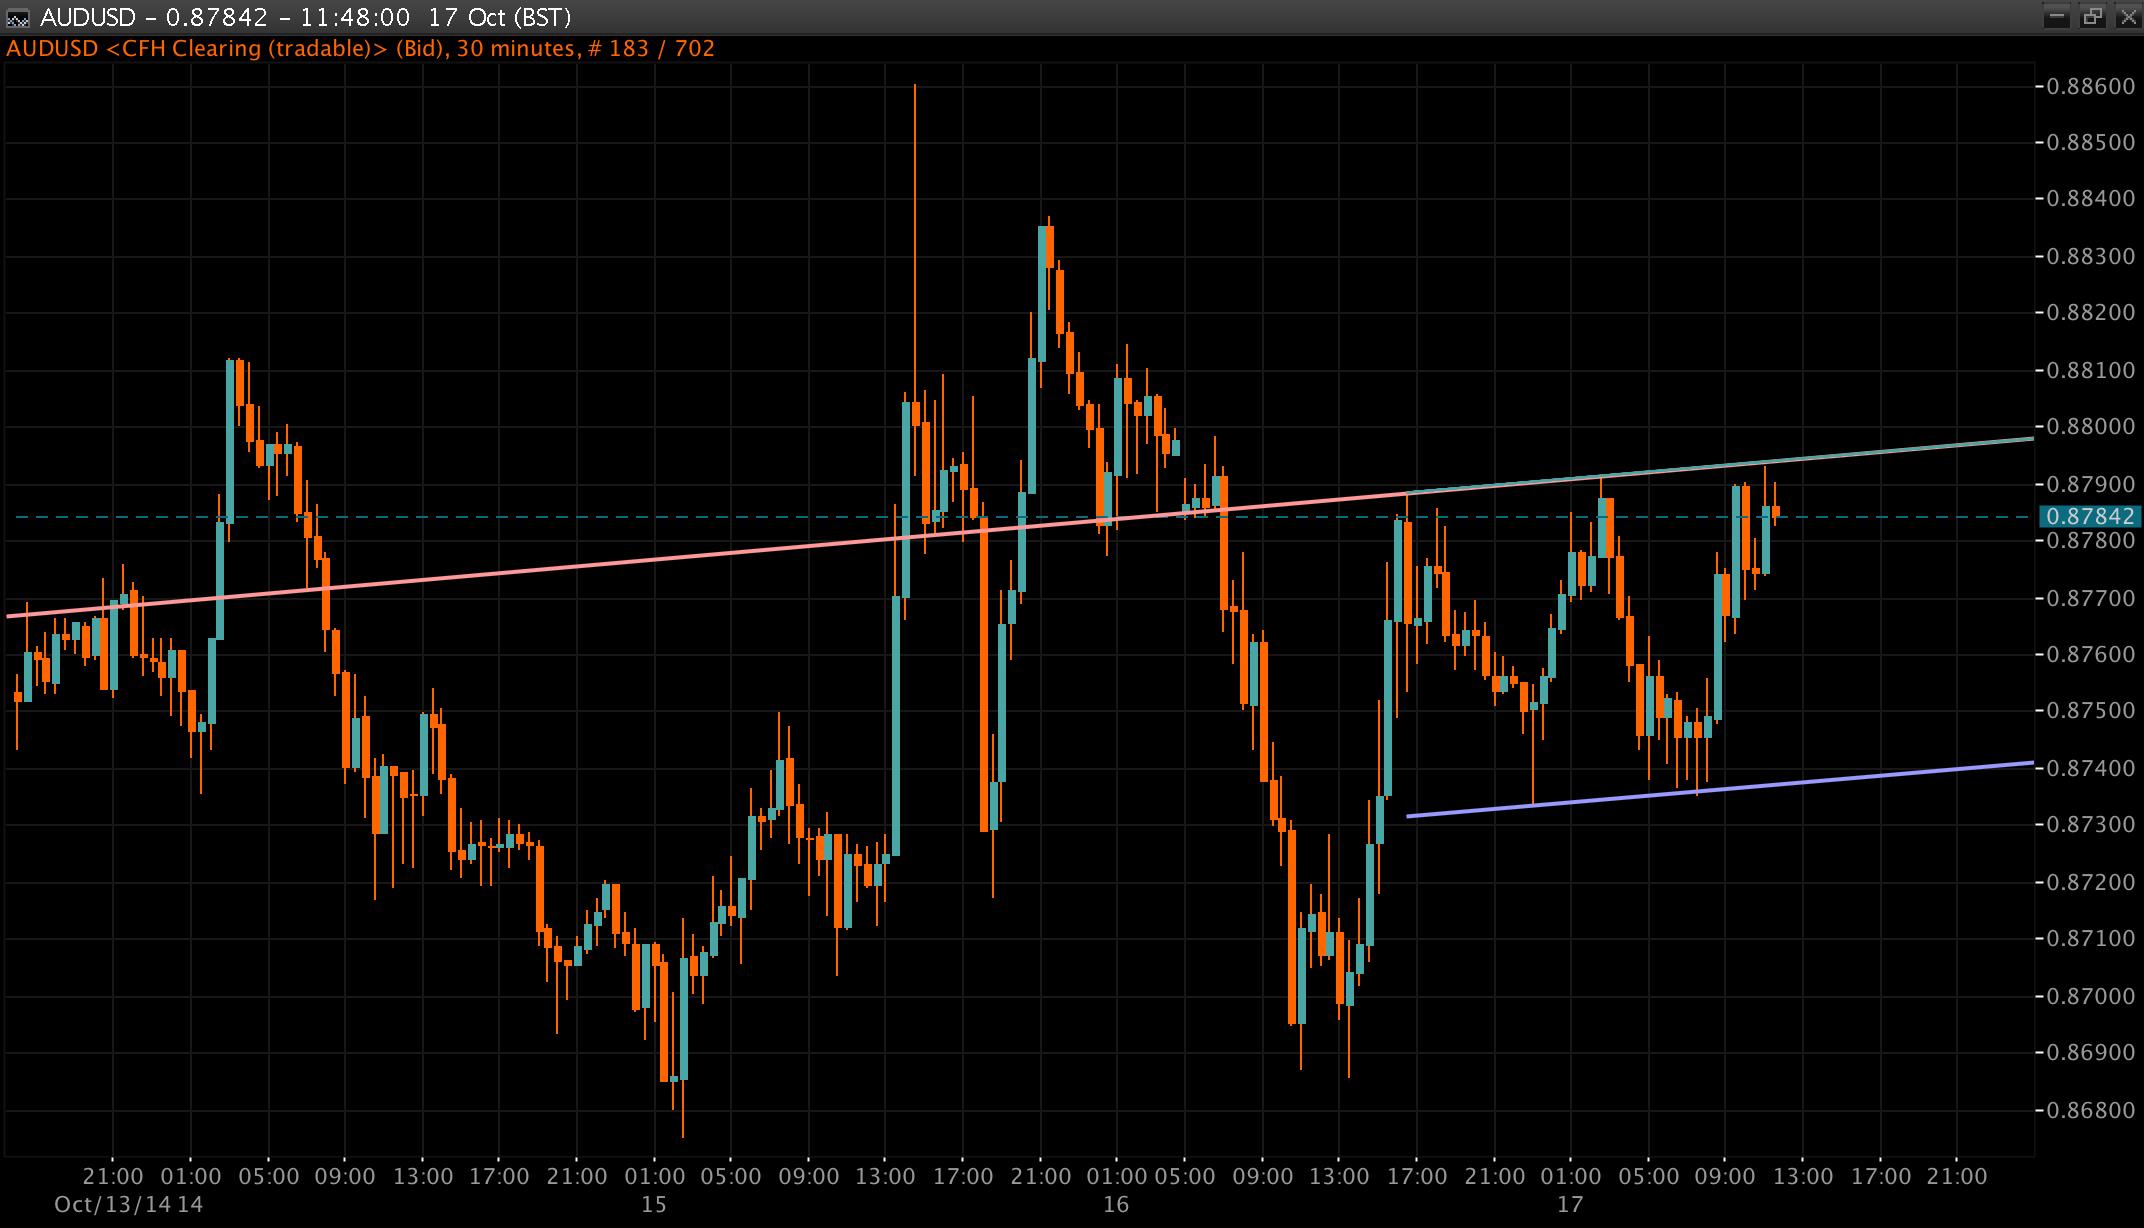 AUD/USD Chart 17 Oct 2014